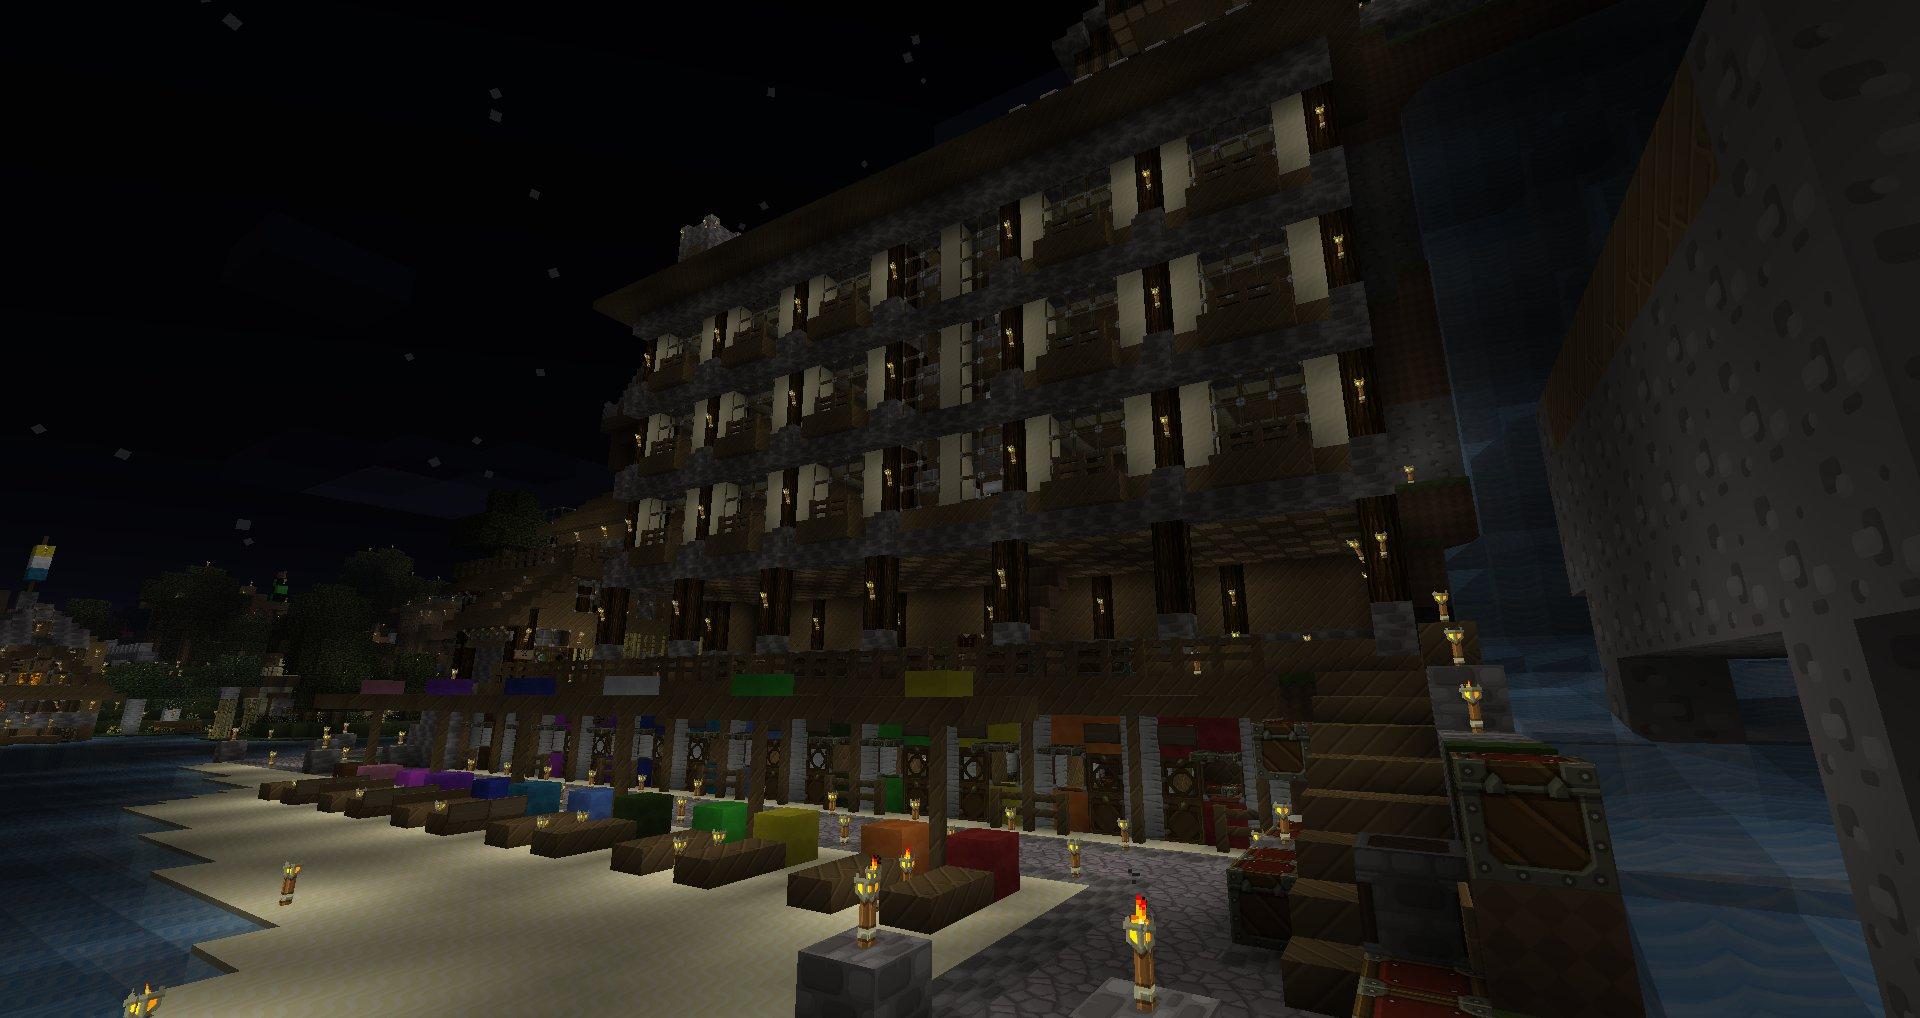 Un hôtel à Rodville. 51eea6b2-e1e1-4dc7-bbd1-1aac24b1964d